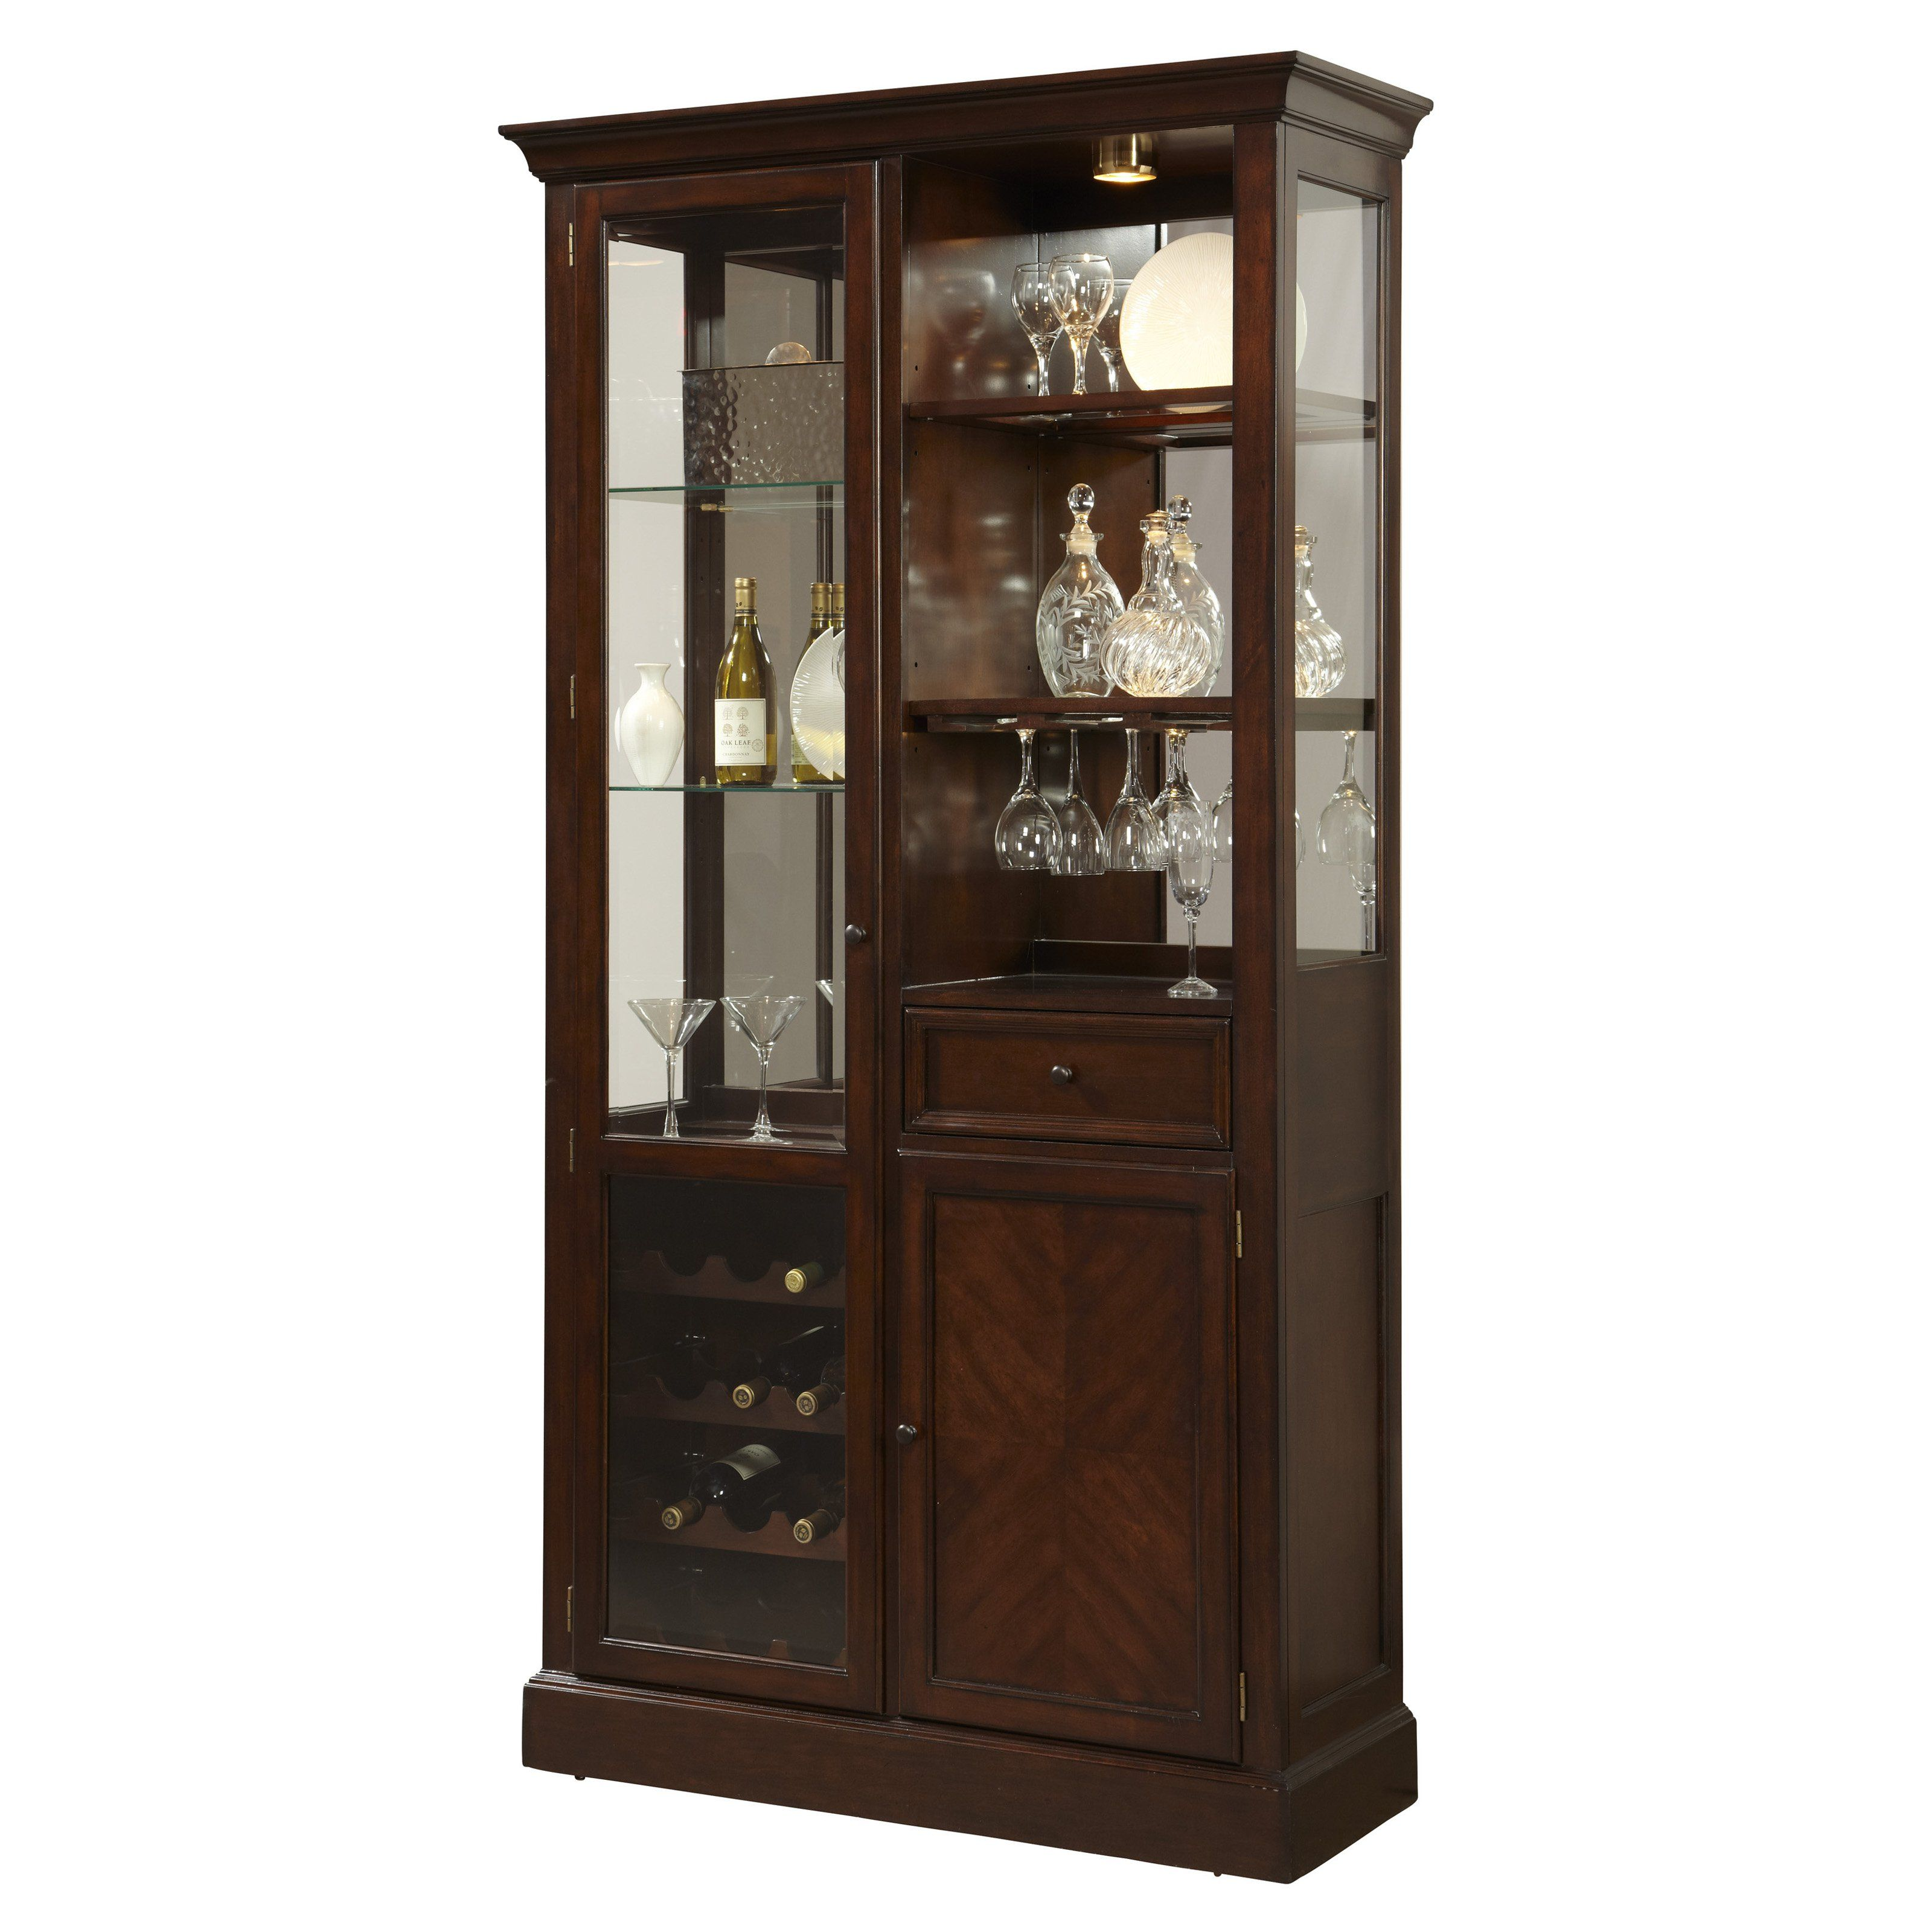 Have to have it Pulaski Dark Wood Curio Bar Cabinet $1419 99